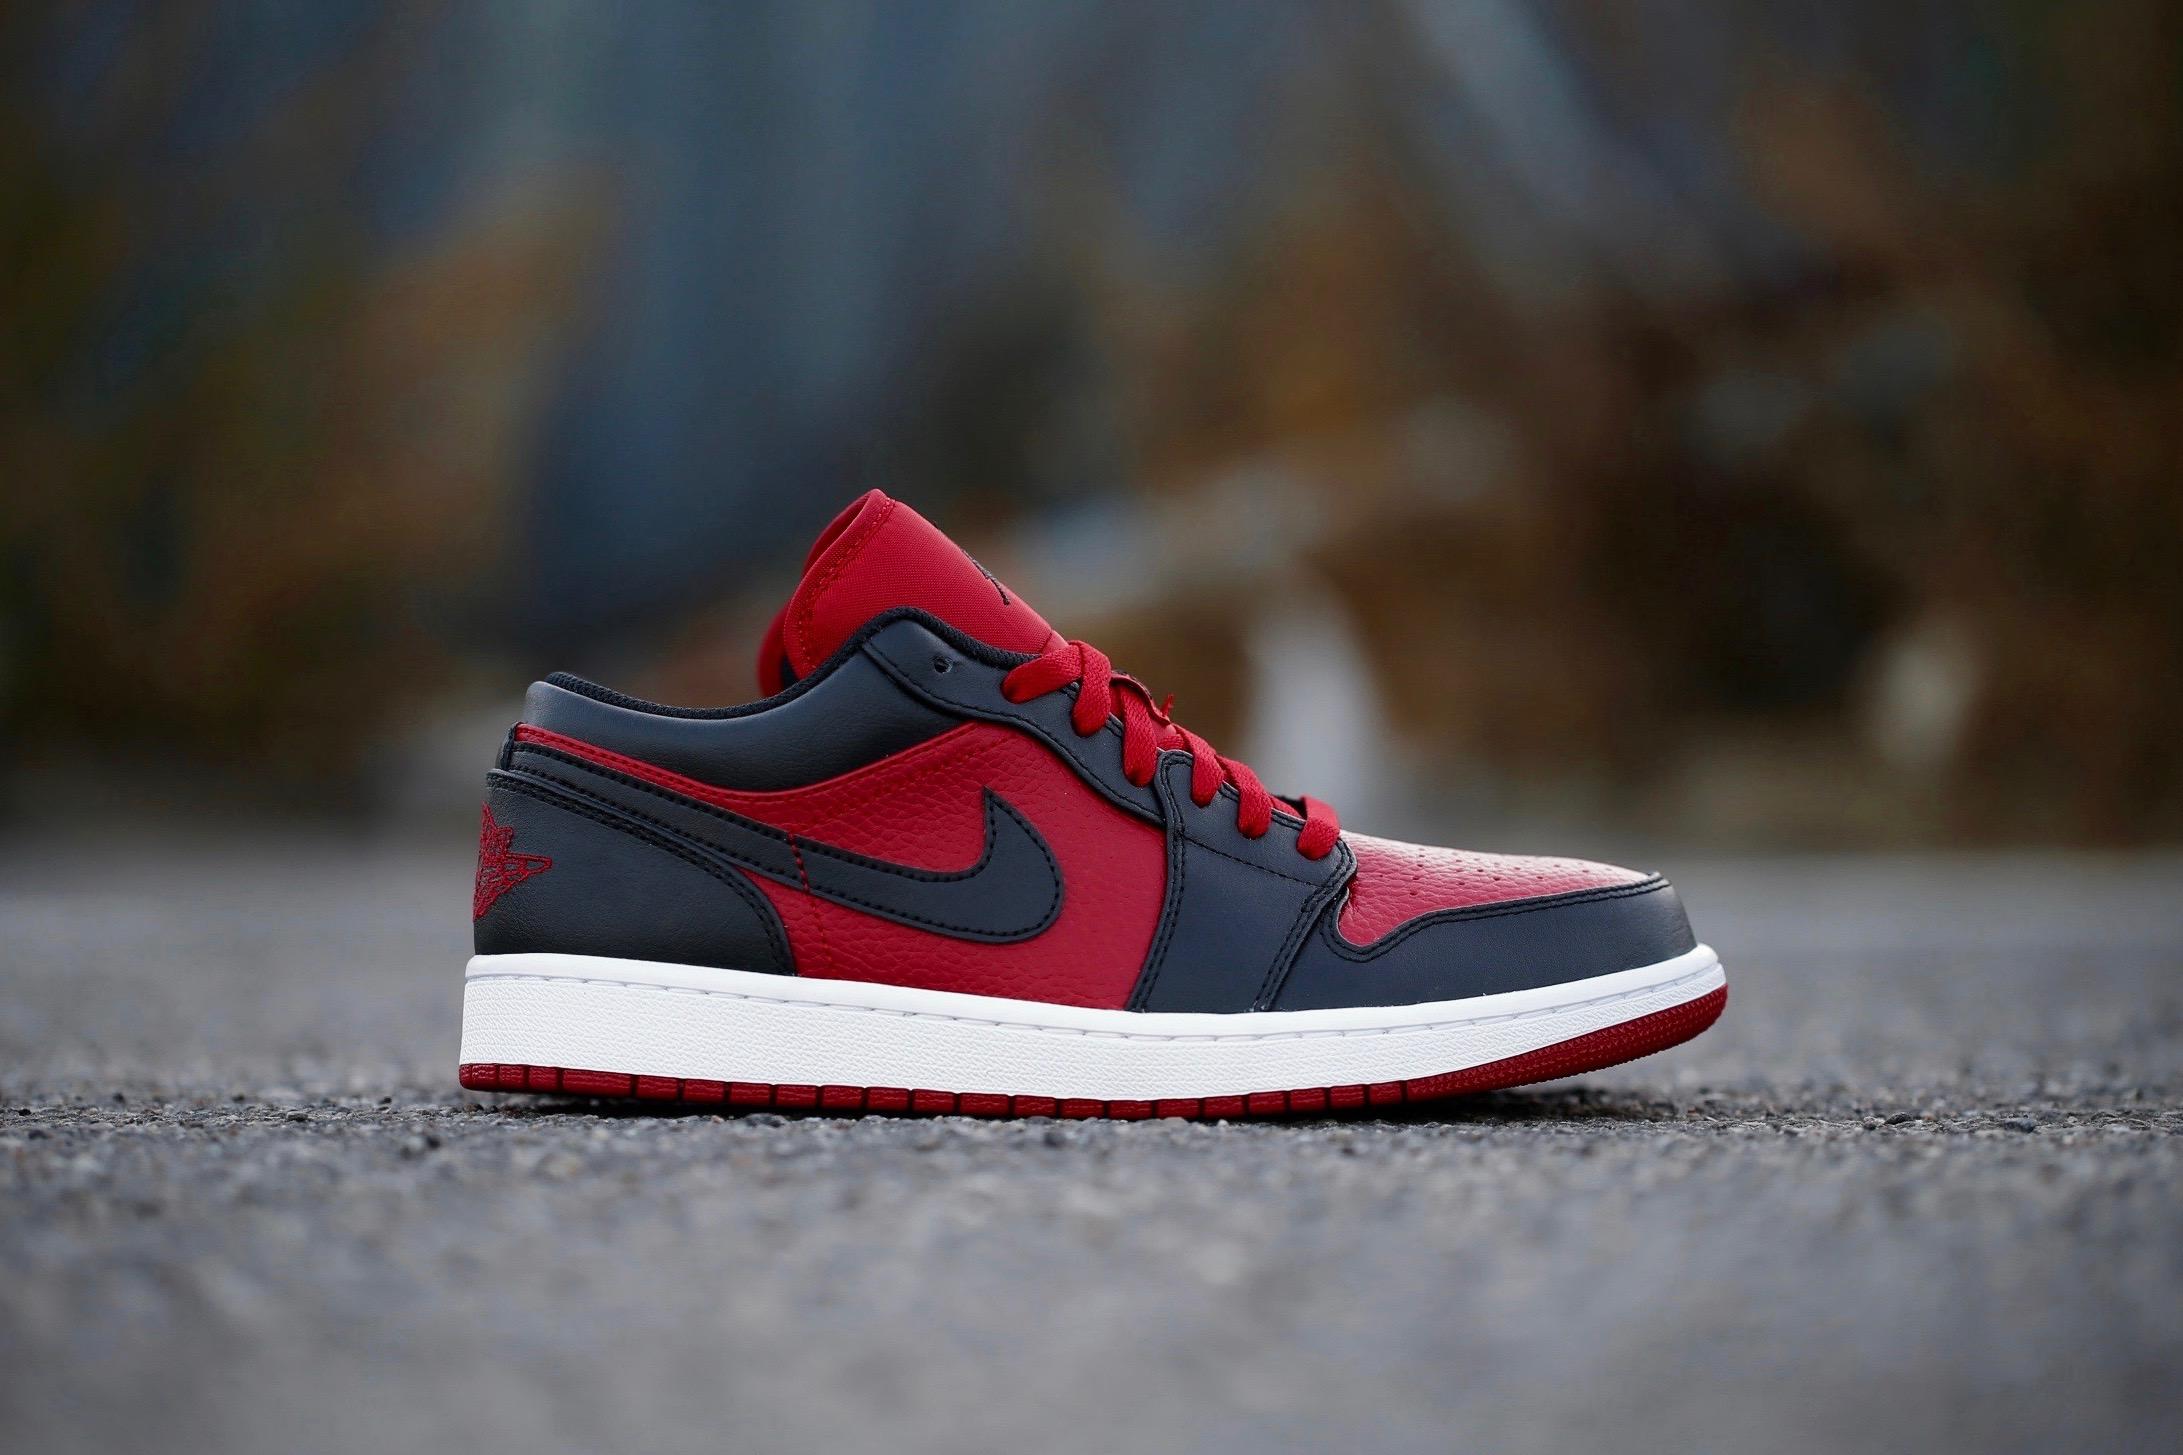 fd09042d30c Air Jordan 1 Low – Gym Red   Black – STASP